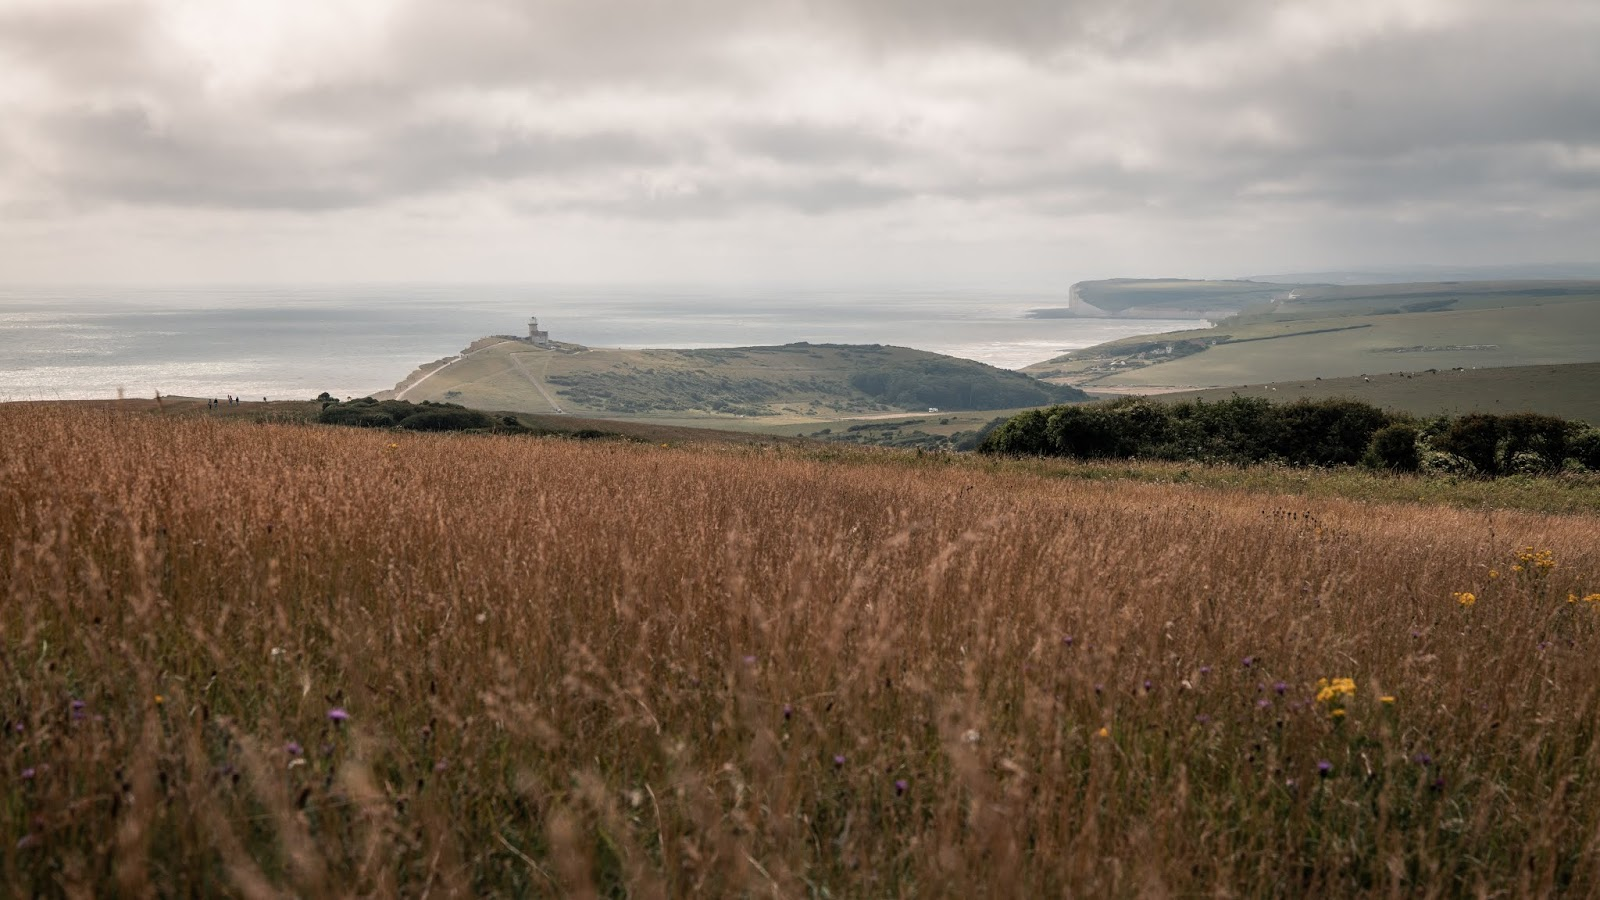 Panasonic Lumix 24-70mm f2.8 Landscape